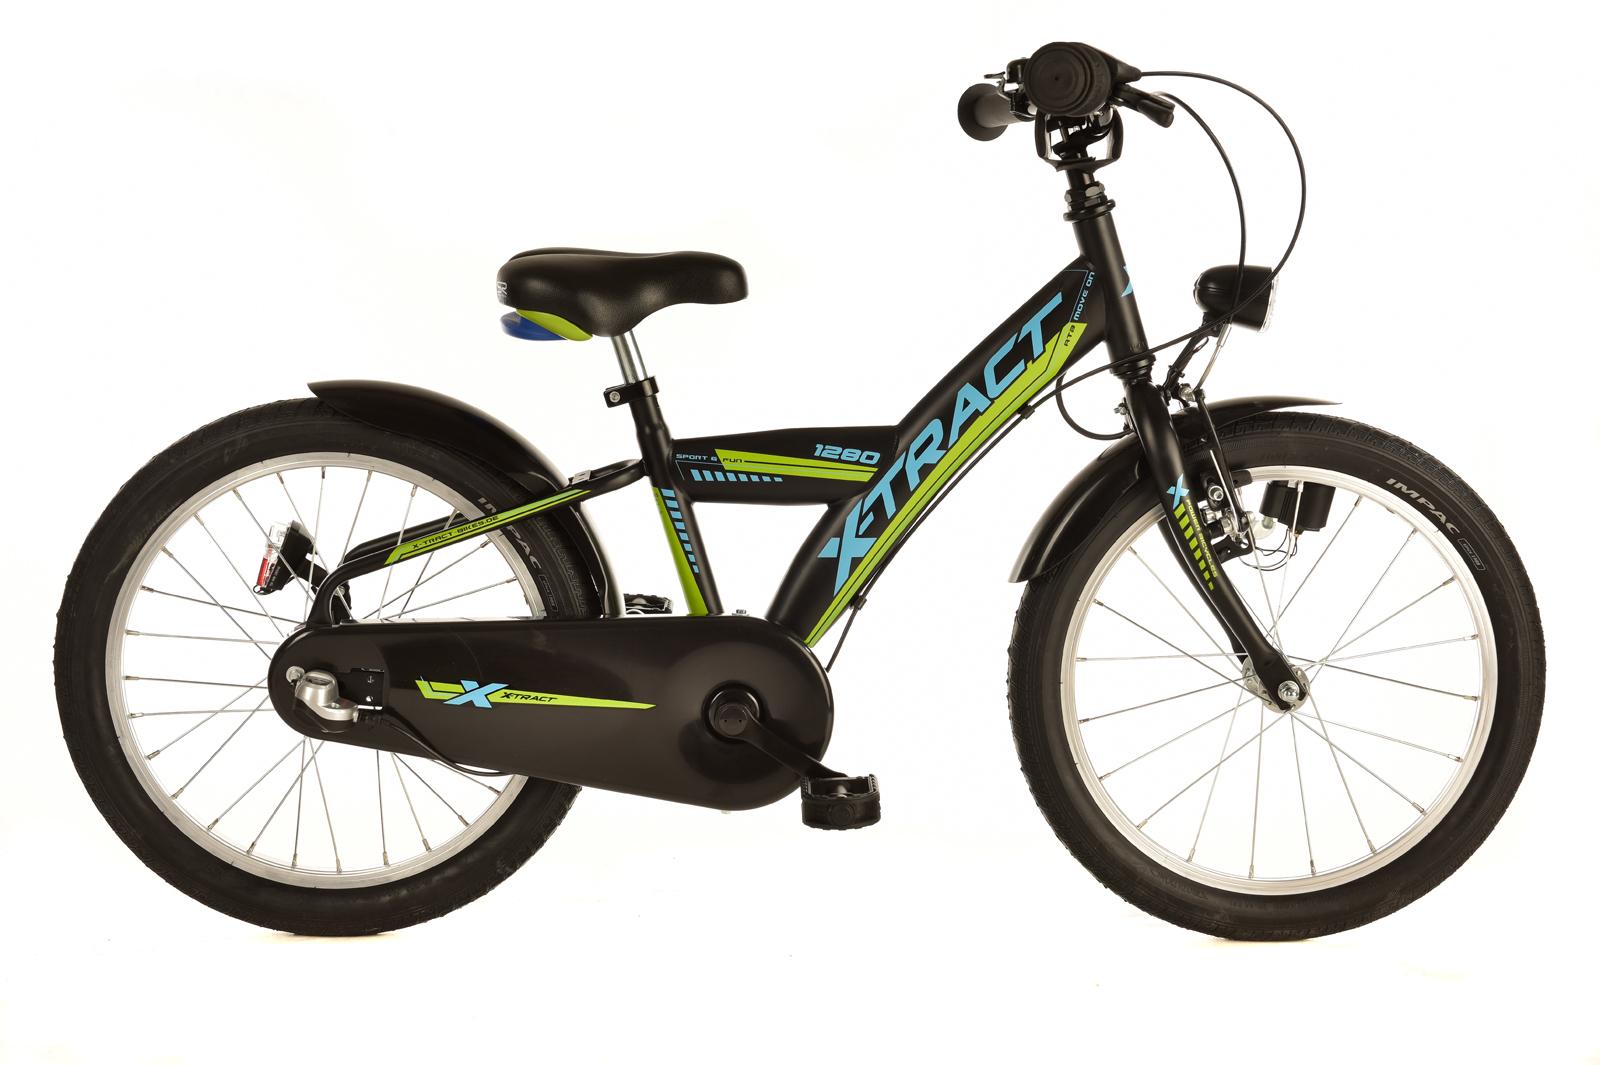 X Tract 1280 Schwarz Feldmeier Bikes